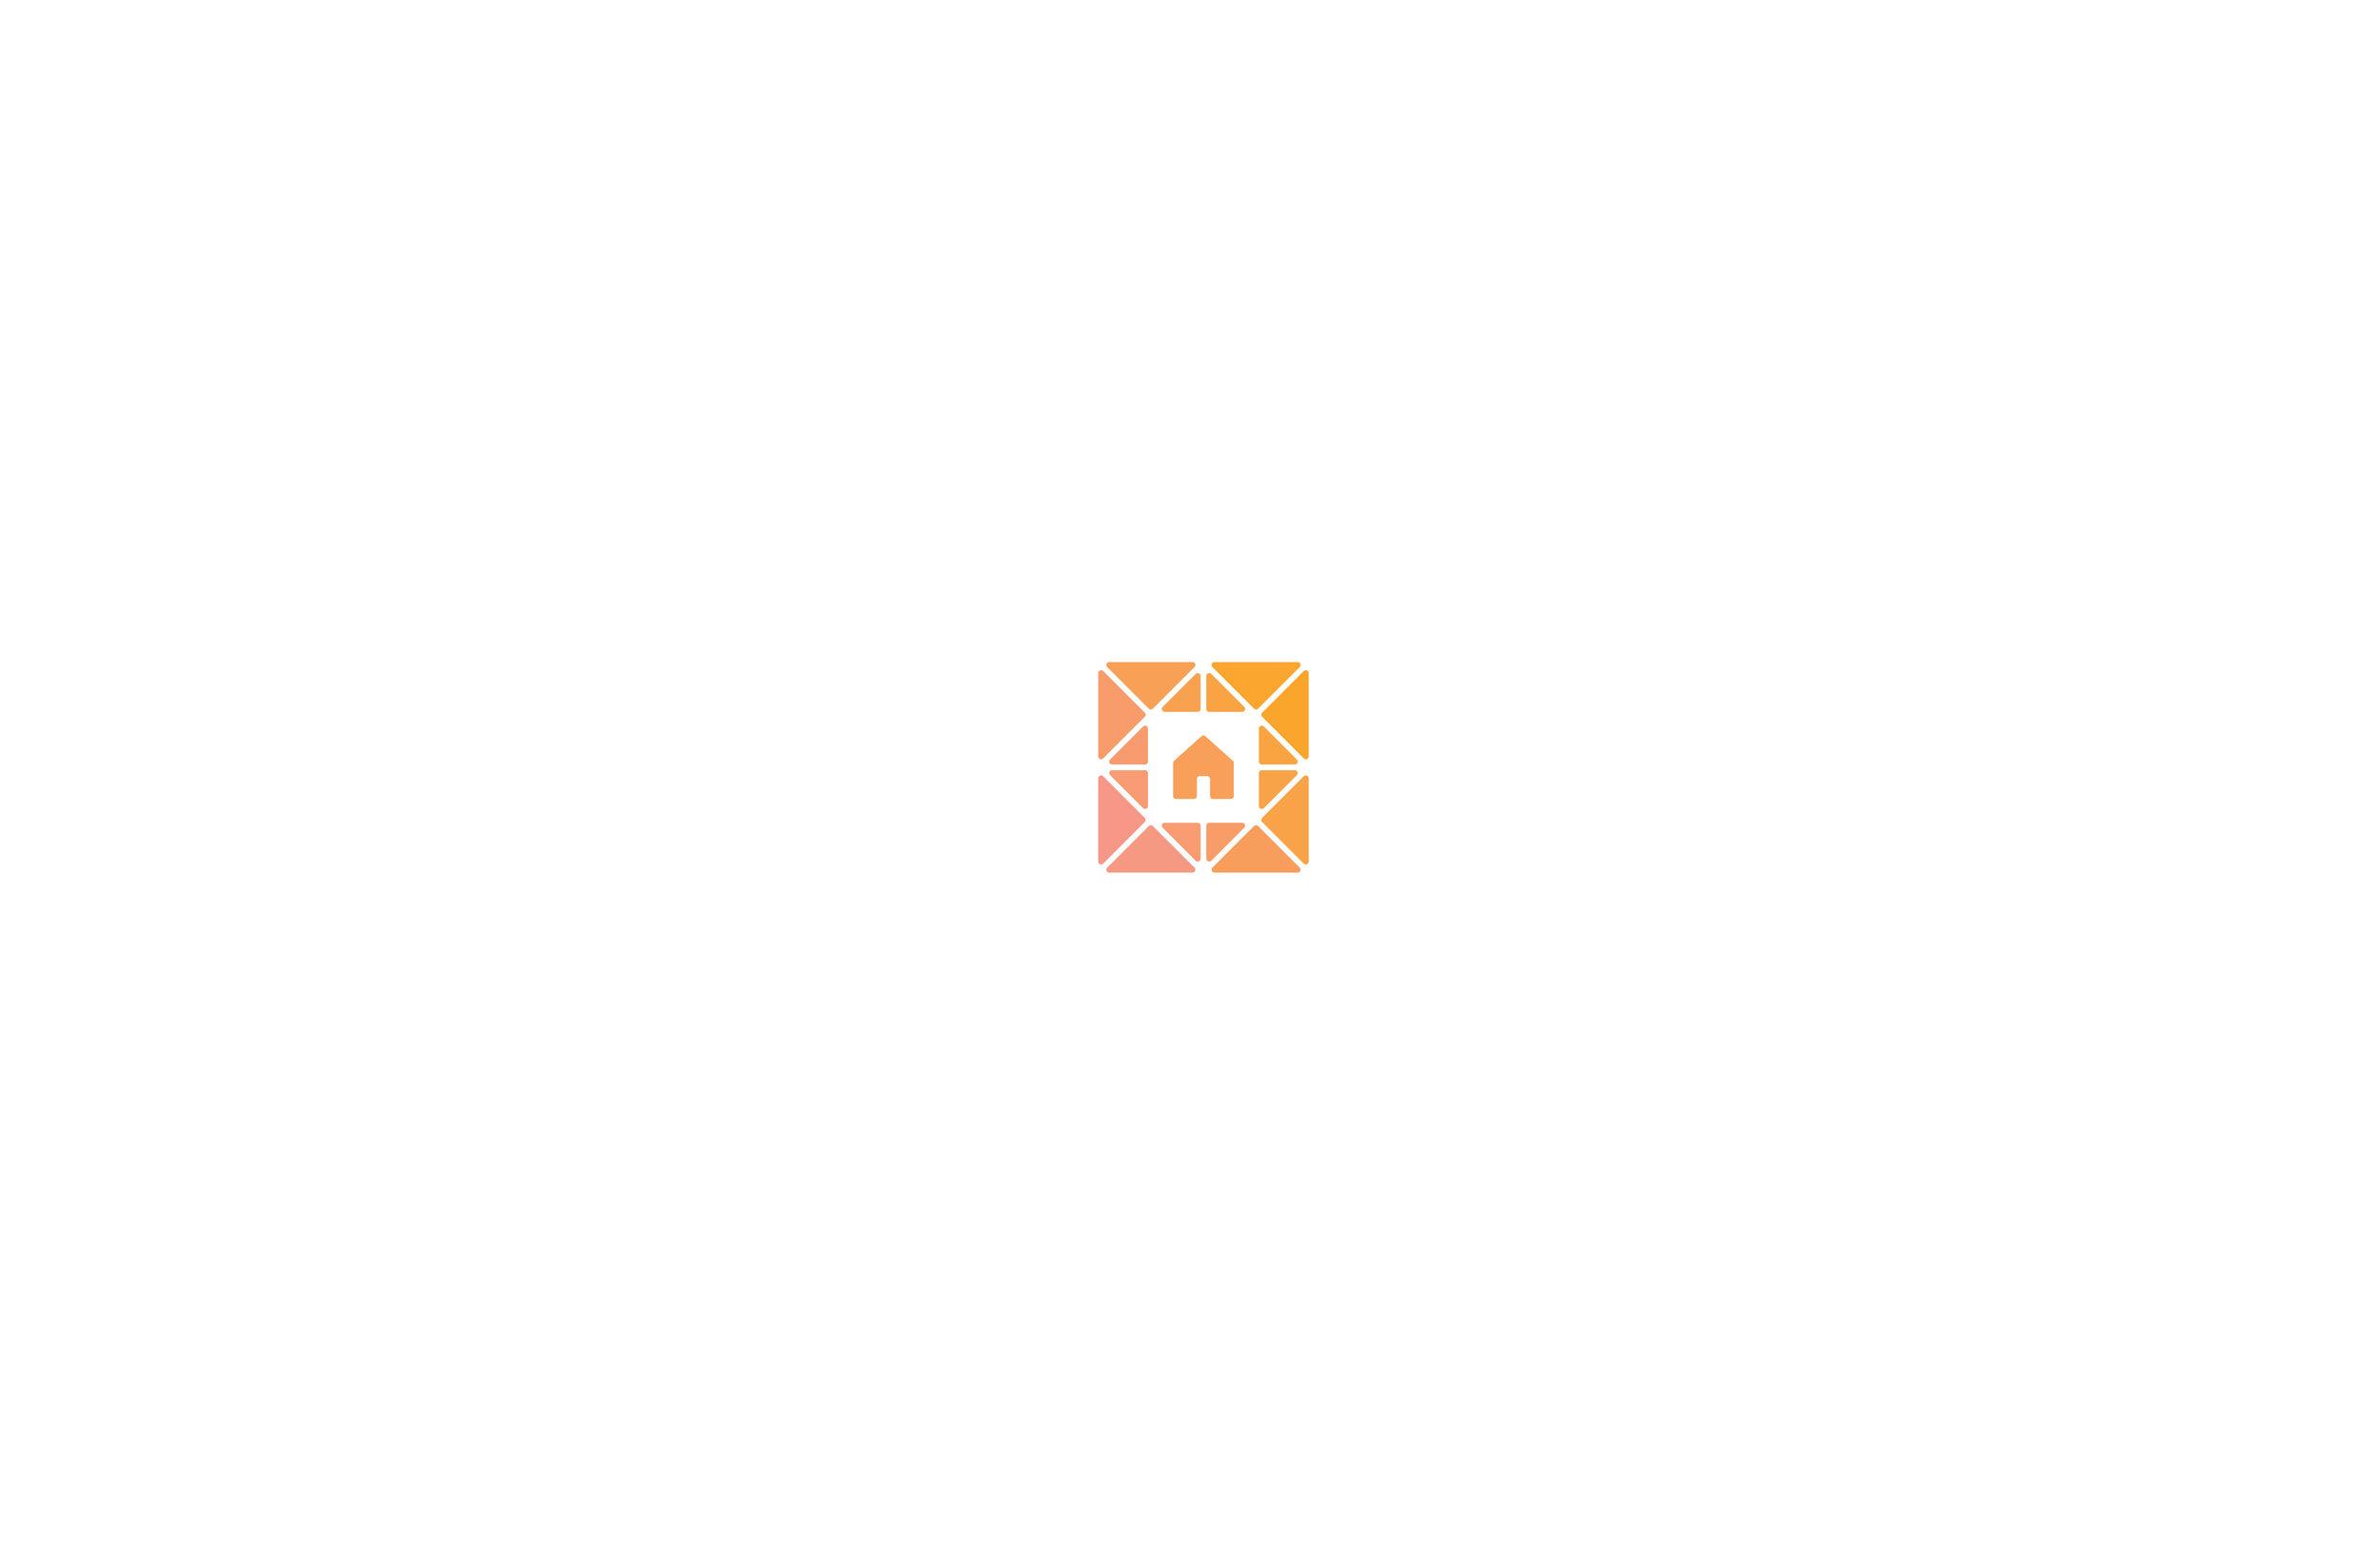 futurehaus_logo.jpg